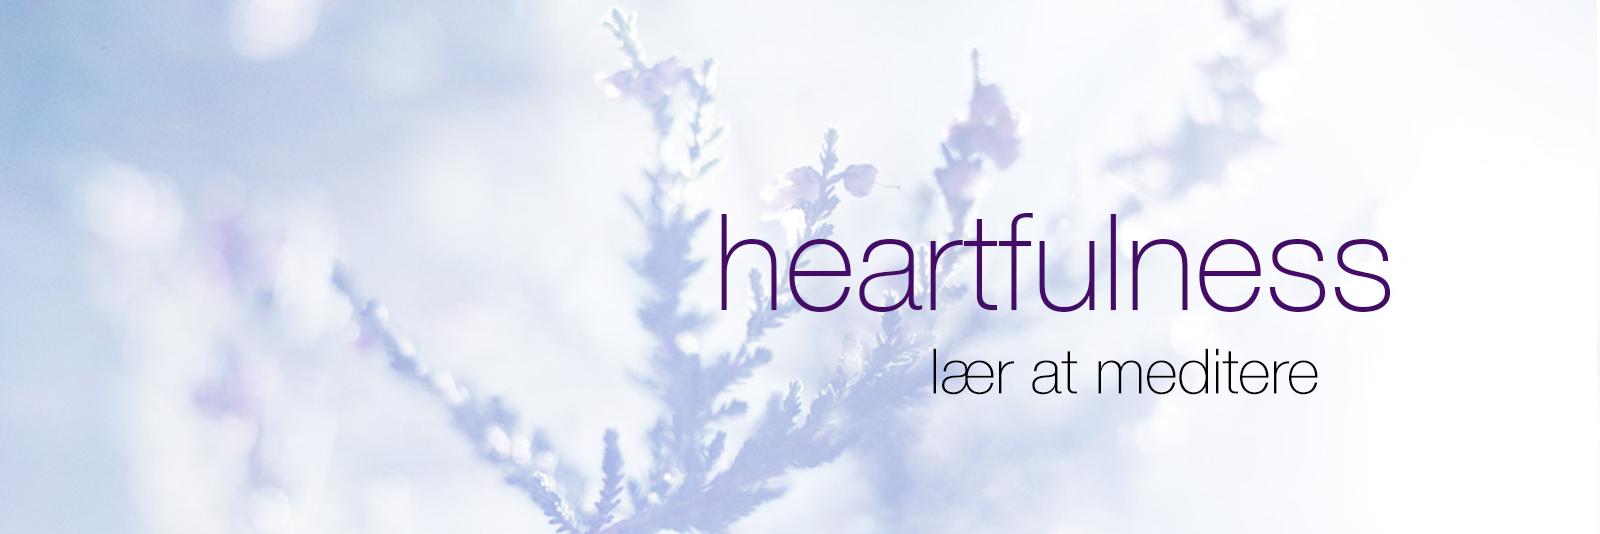 Heartfulness Meditation Danmark